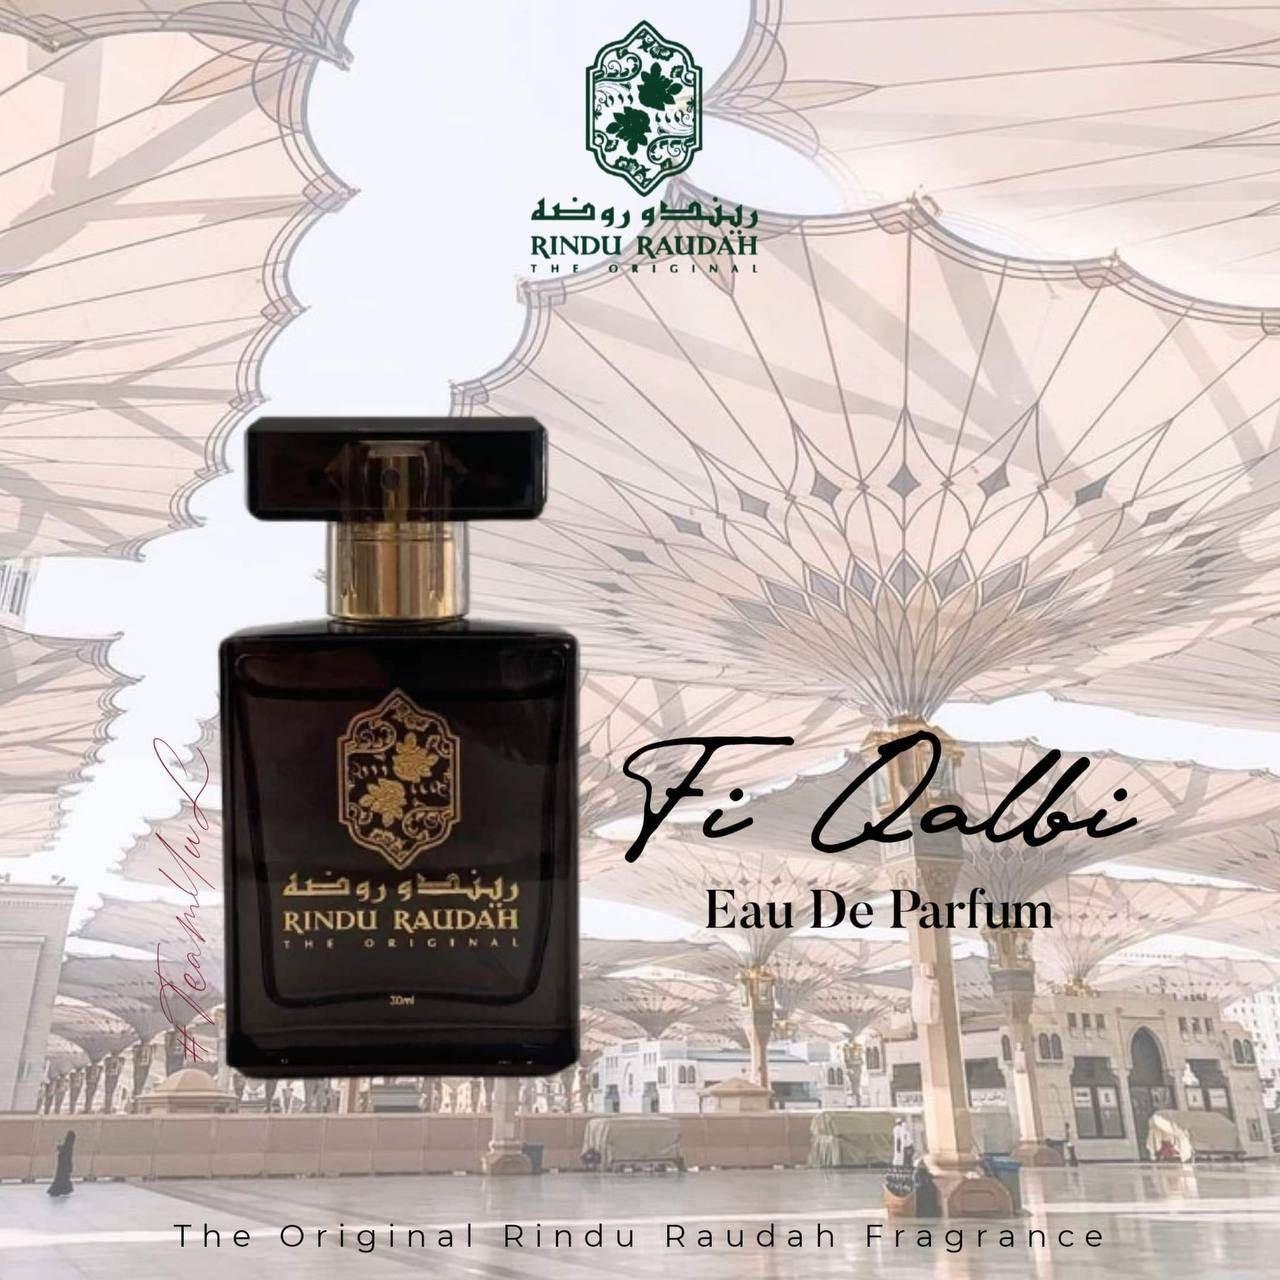 Rindu Raudah Perfume